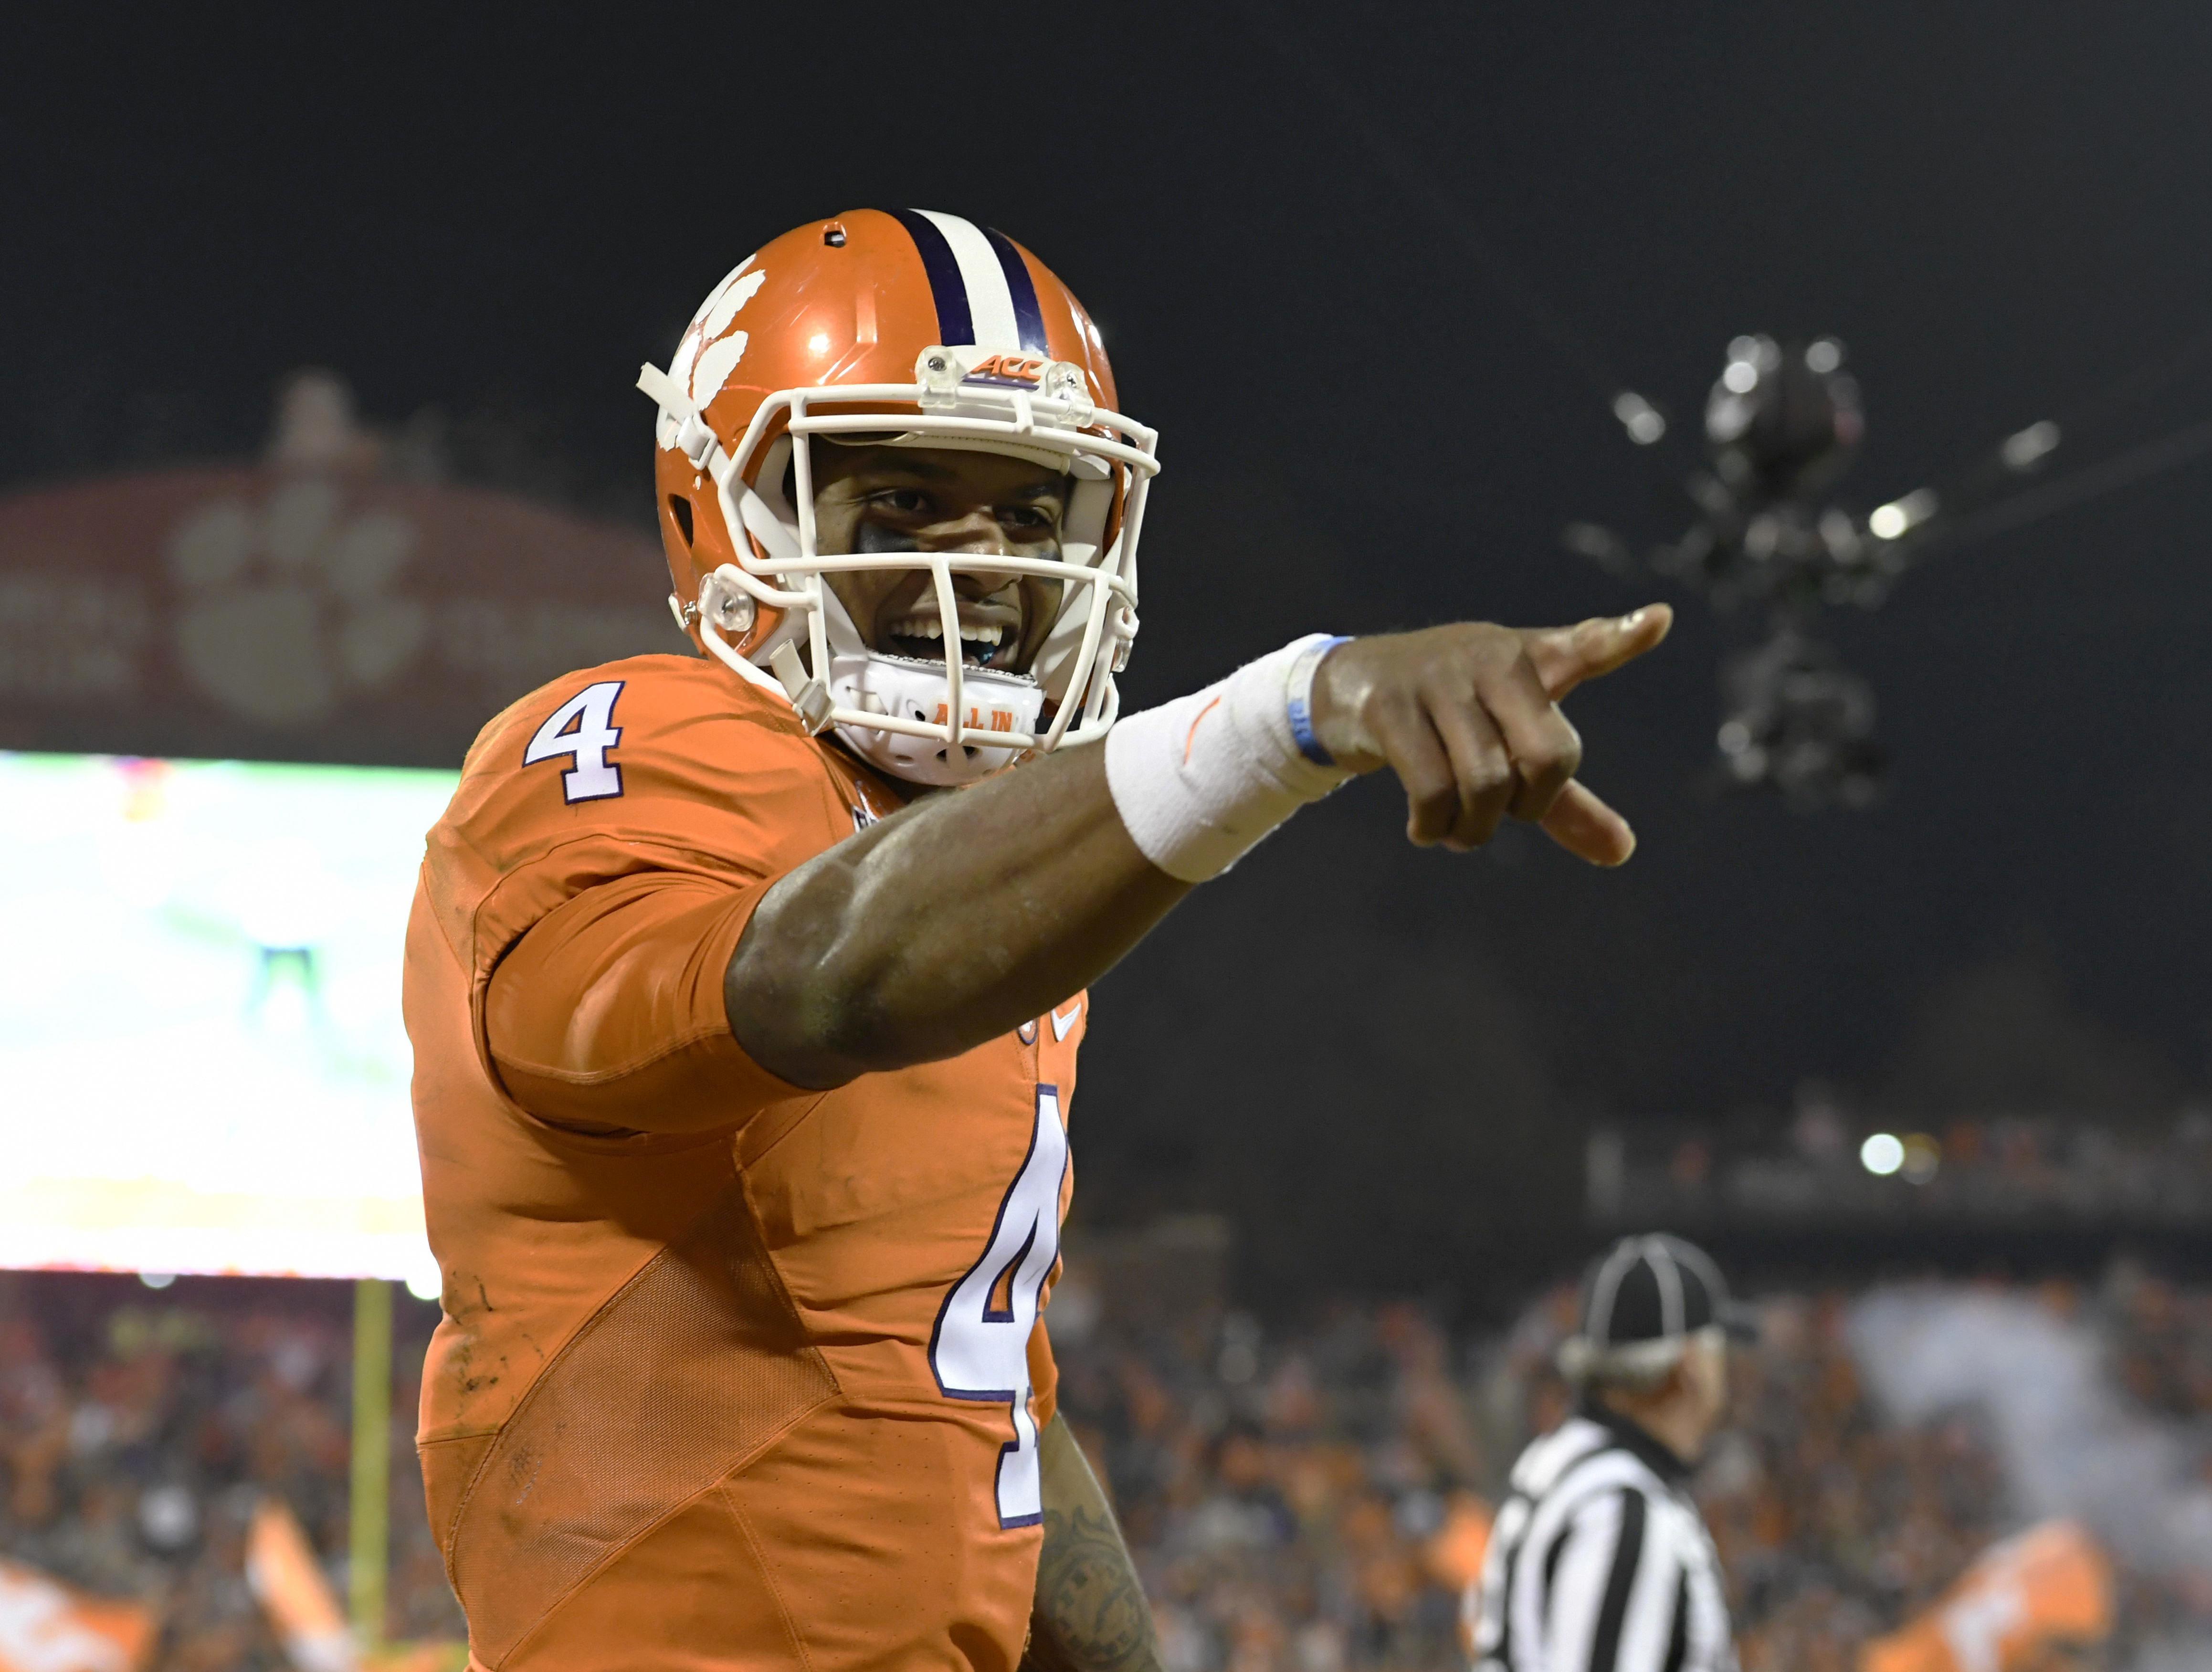 Clemson quarterback Deshaun Watson reacts after throwing a touchdown pass to Artavis Scott during the second half of an NCAA college football game against South Carolina Saturday, Nov. 26, 2016, in Clemson, S.C. (AP Photo/Richard Shiro)